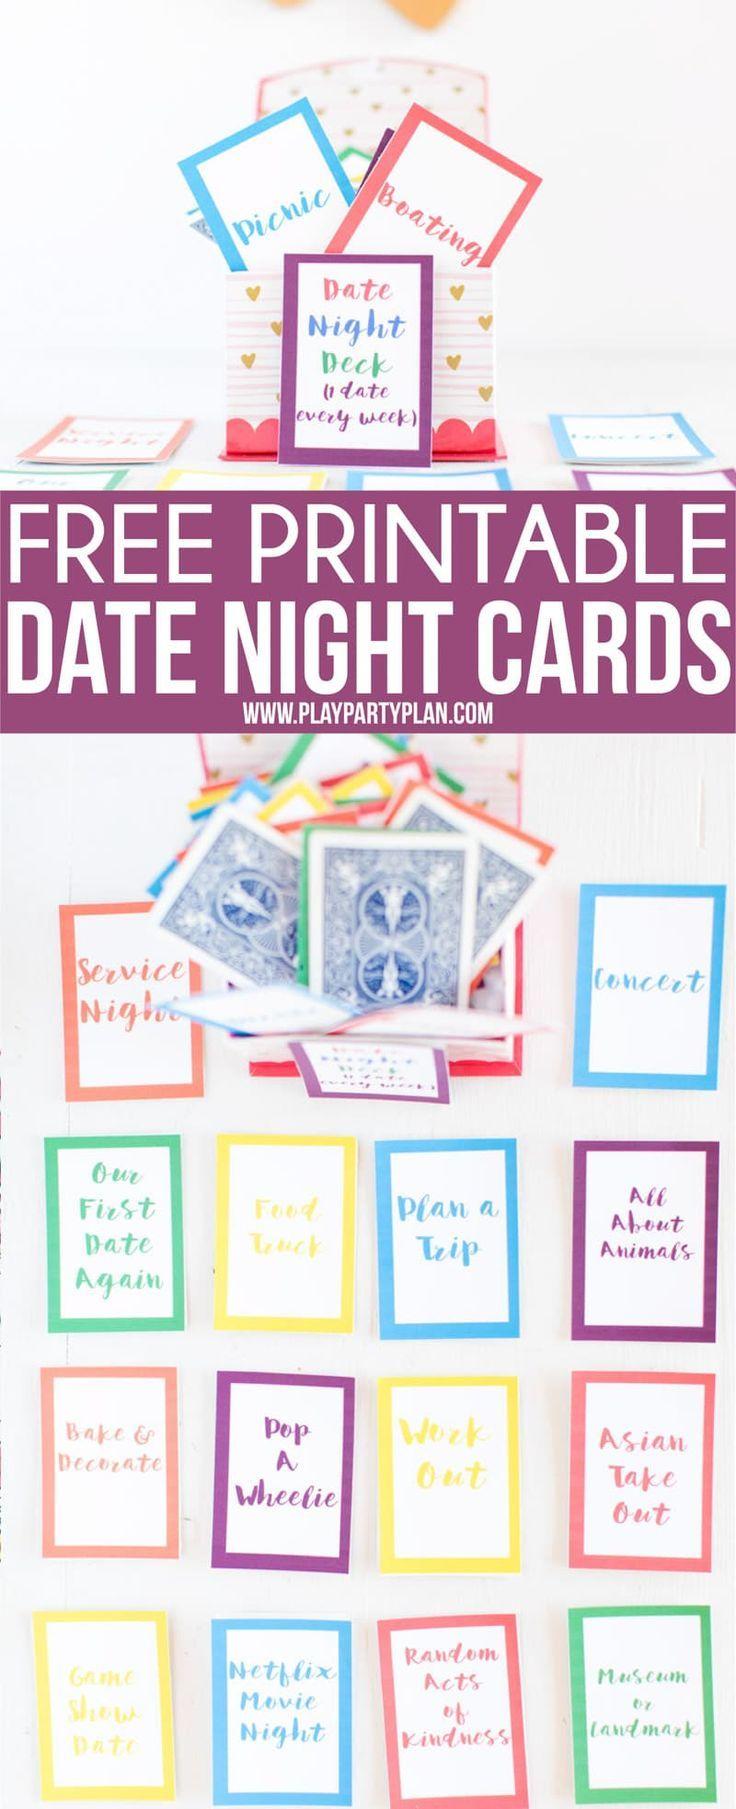 Free Printable Date Night Cards & 150+ Date Night Ideas